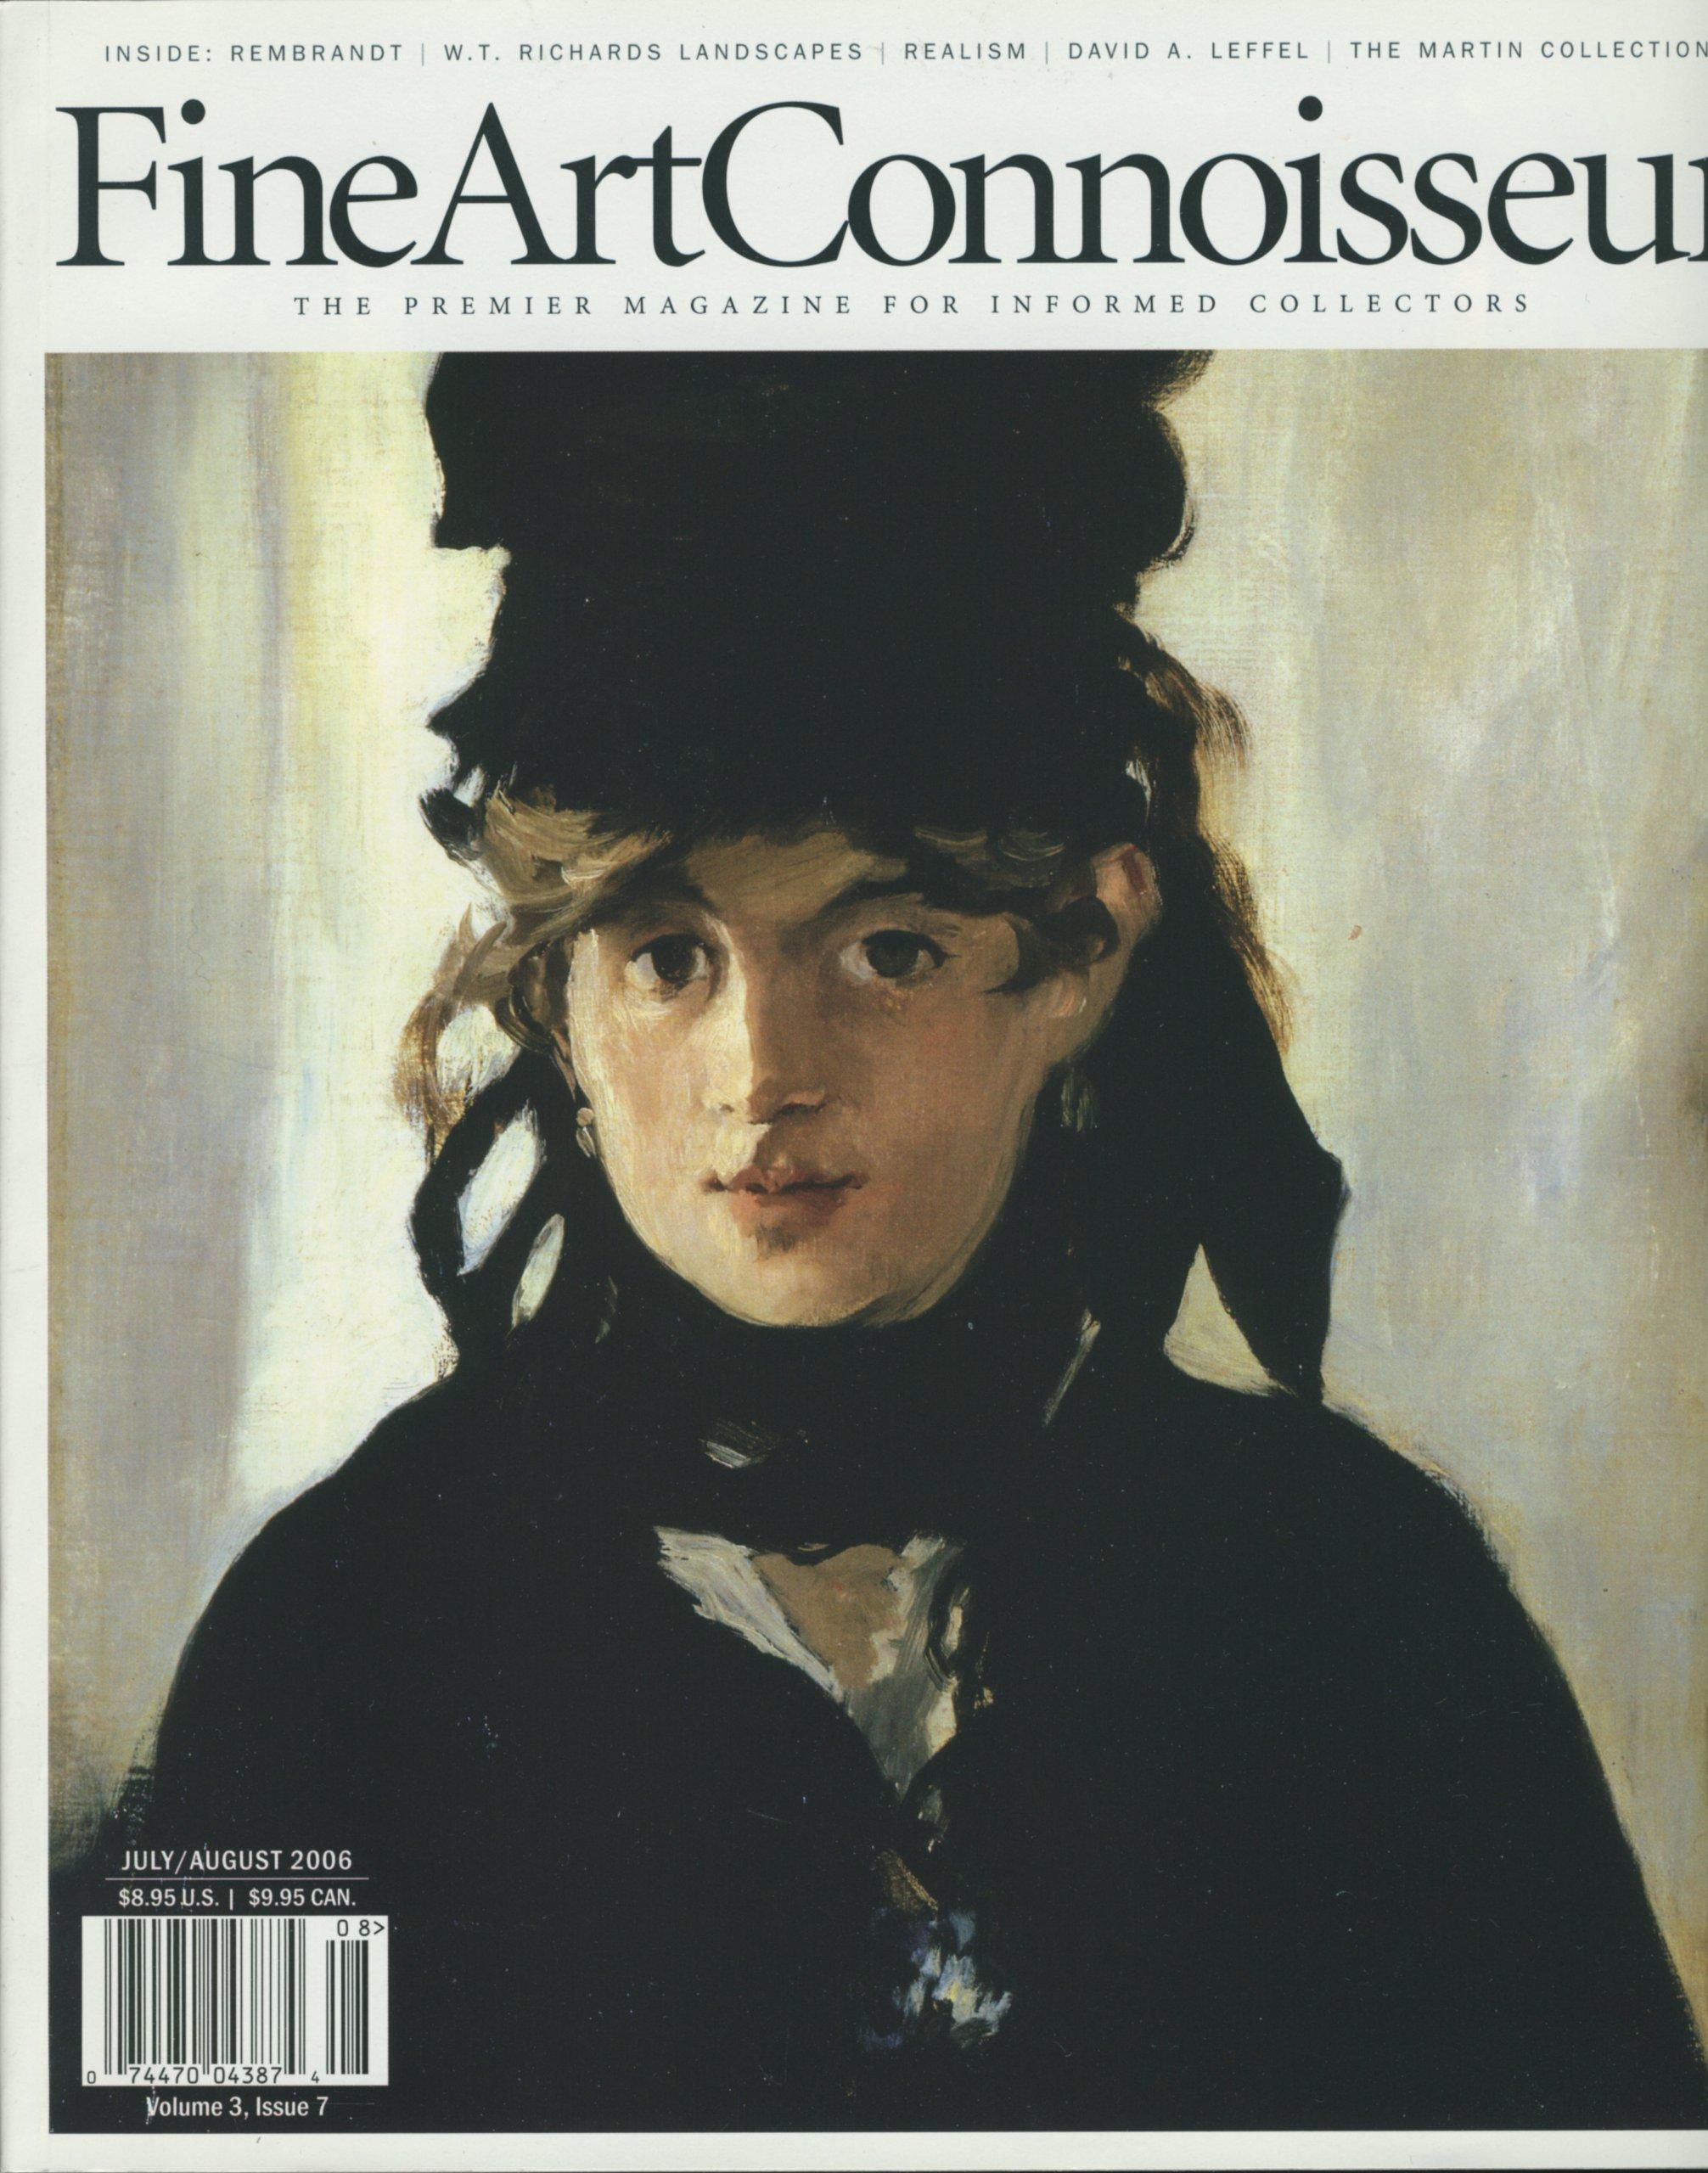 fine art connoisseur july august 2006 rembrandt w t richards landscapes realism david a leffel the martin collection